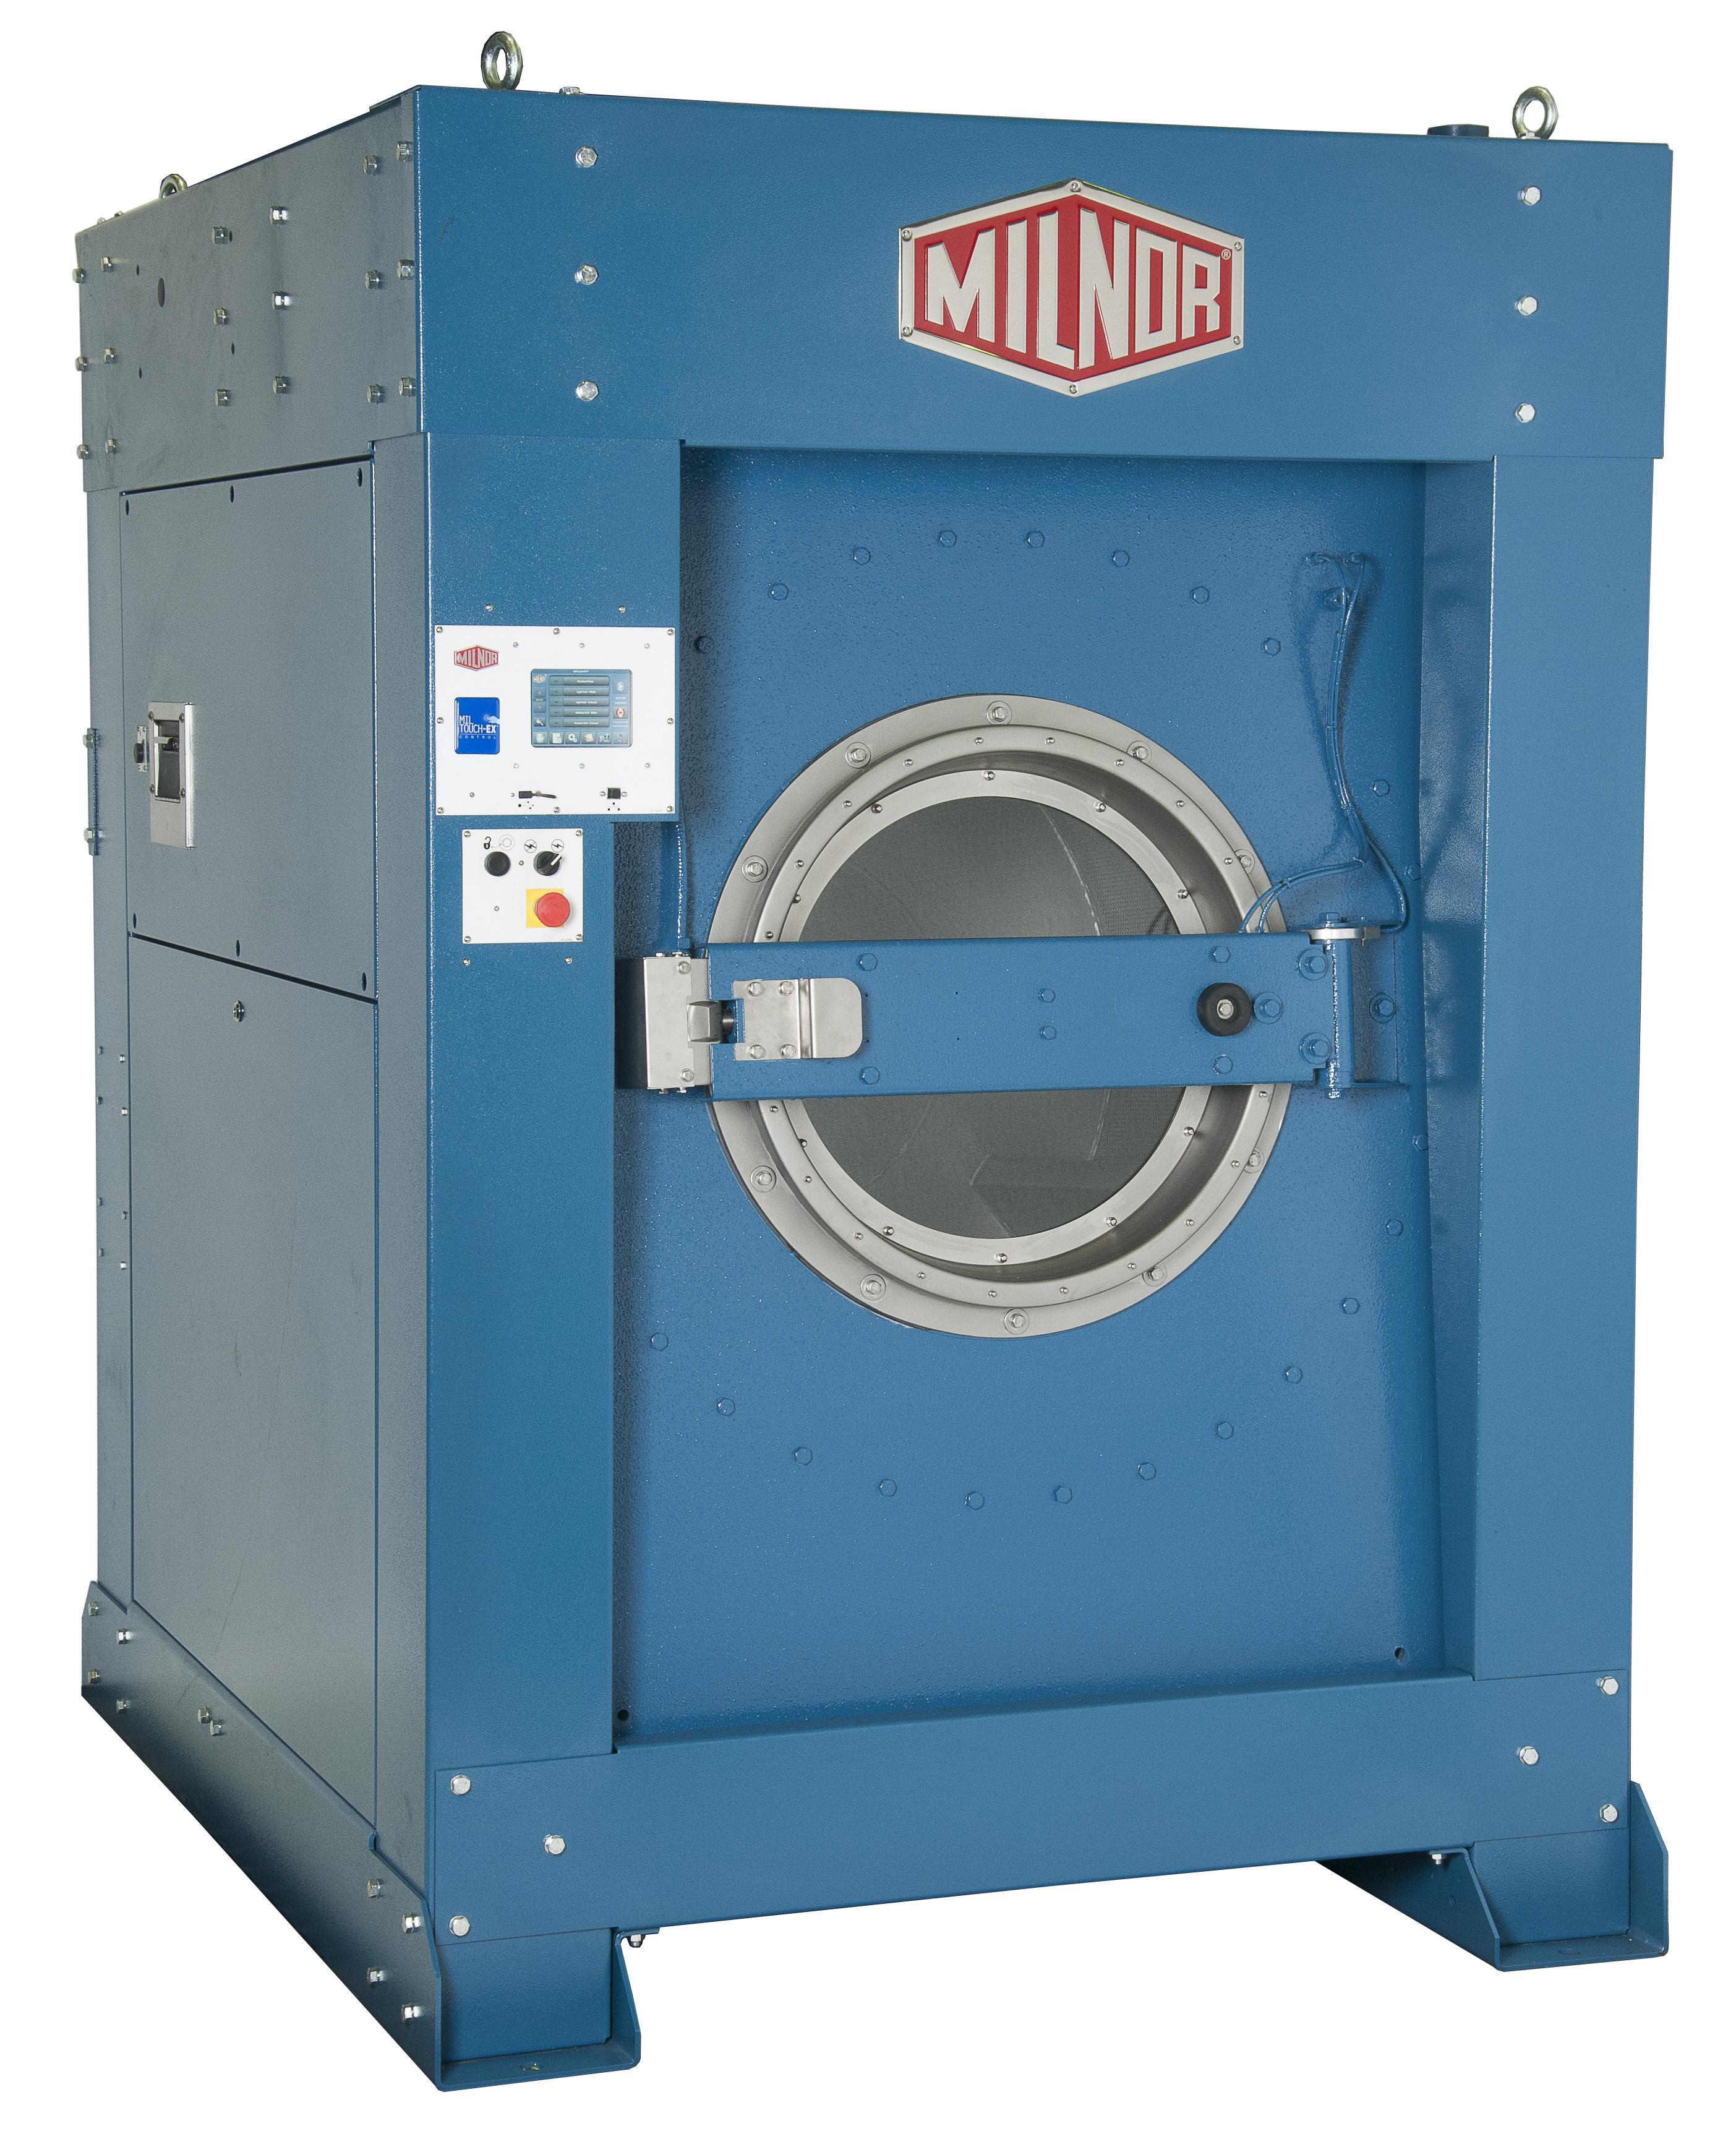 Milnor Washer Extractor ~ R pellerin milnor corporation